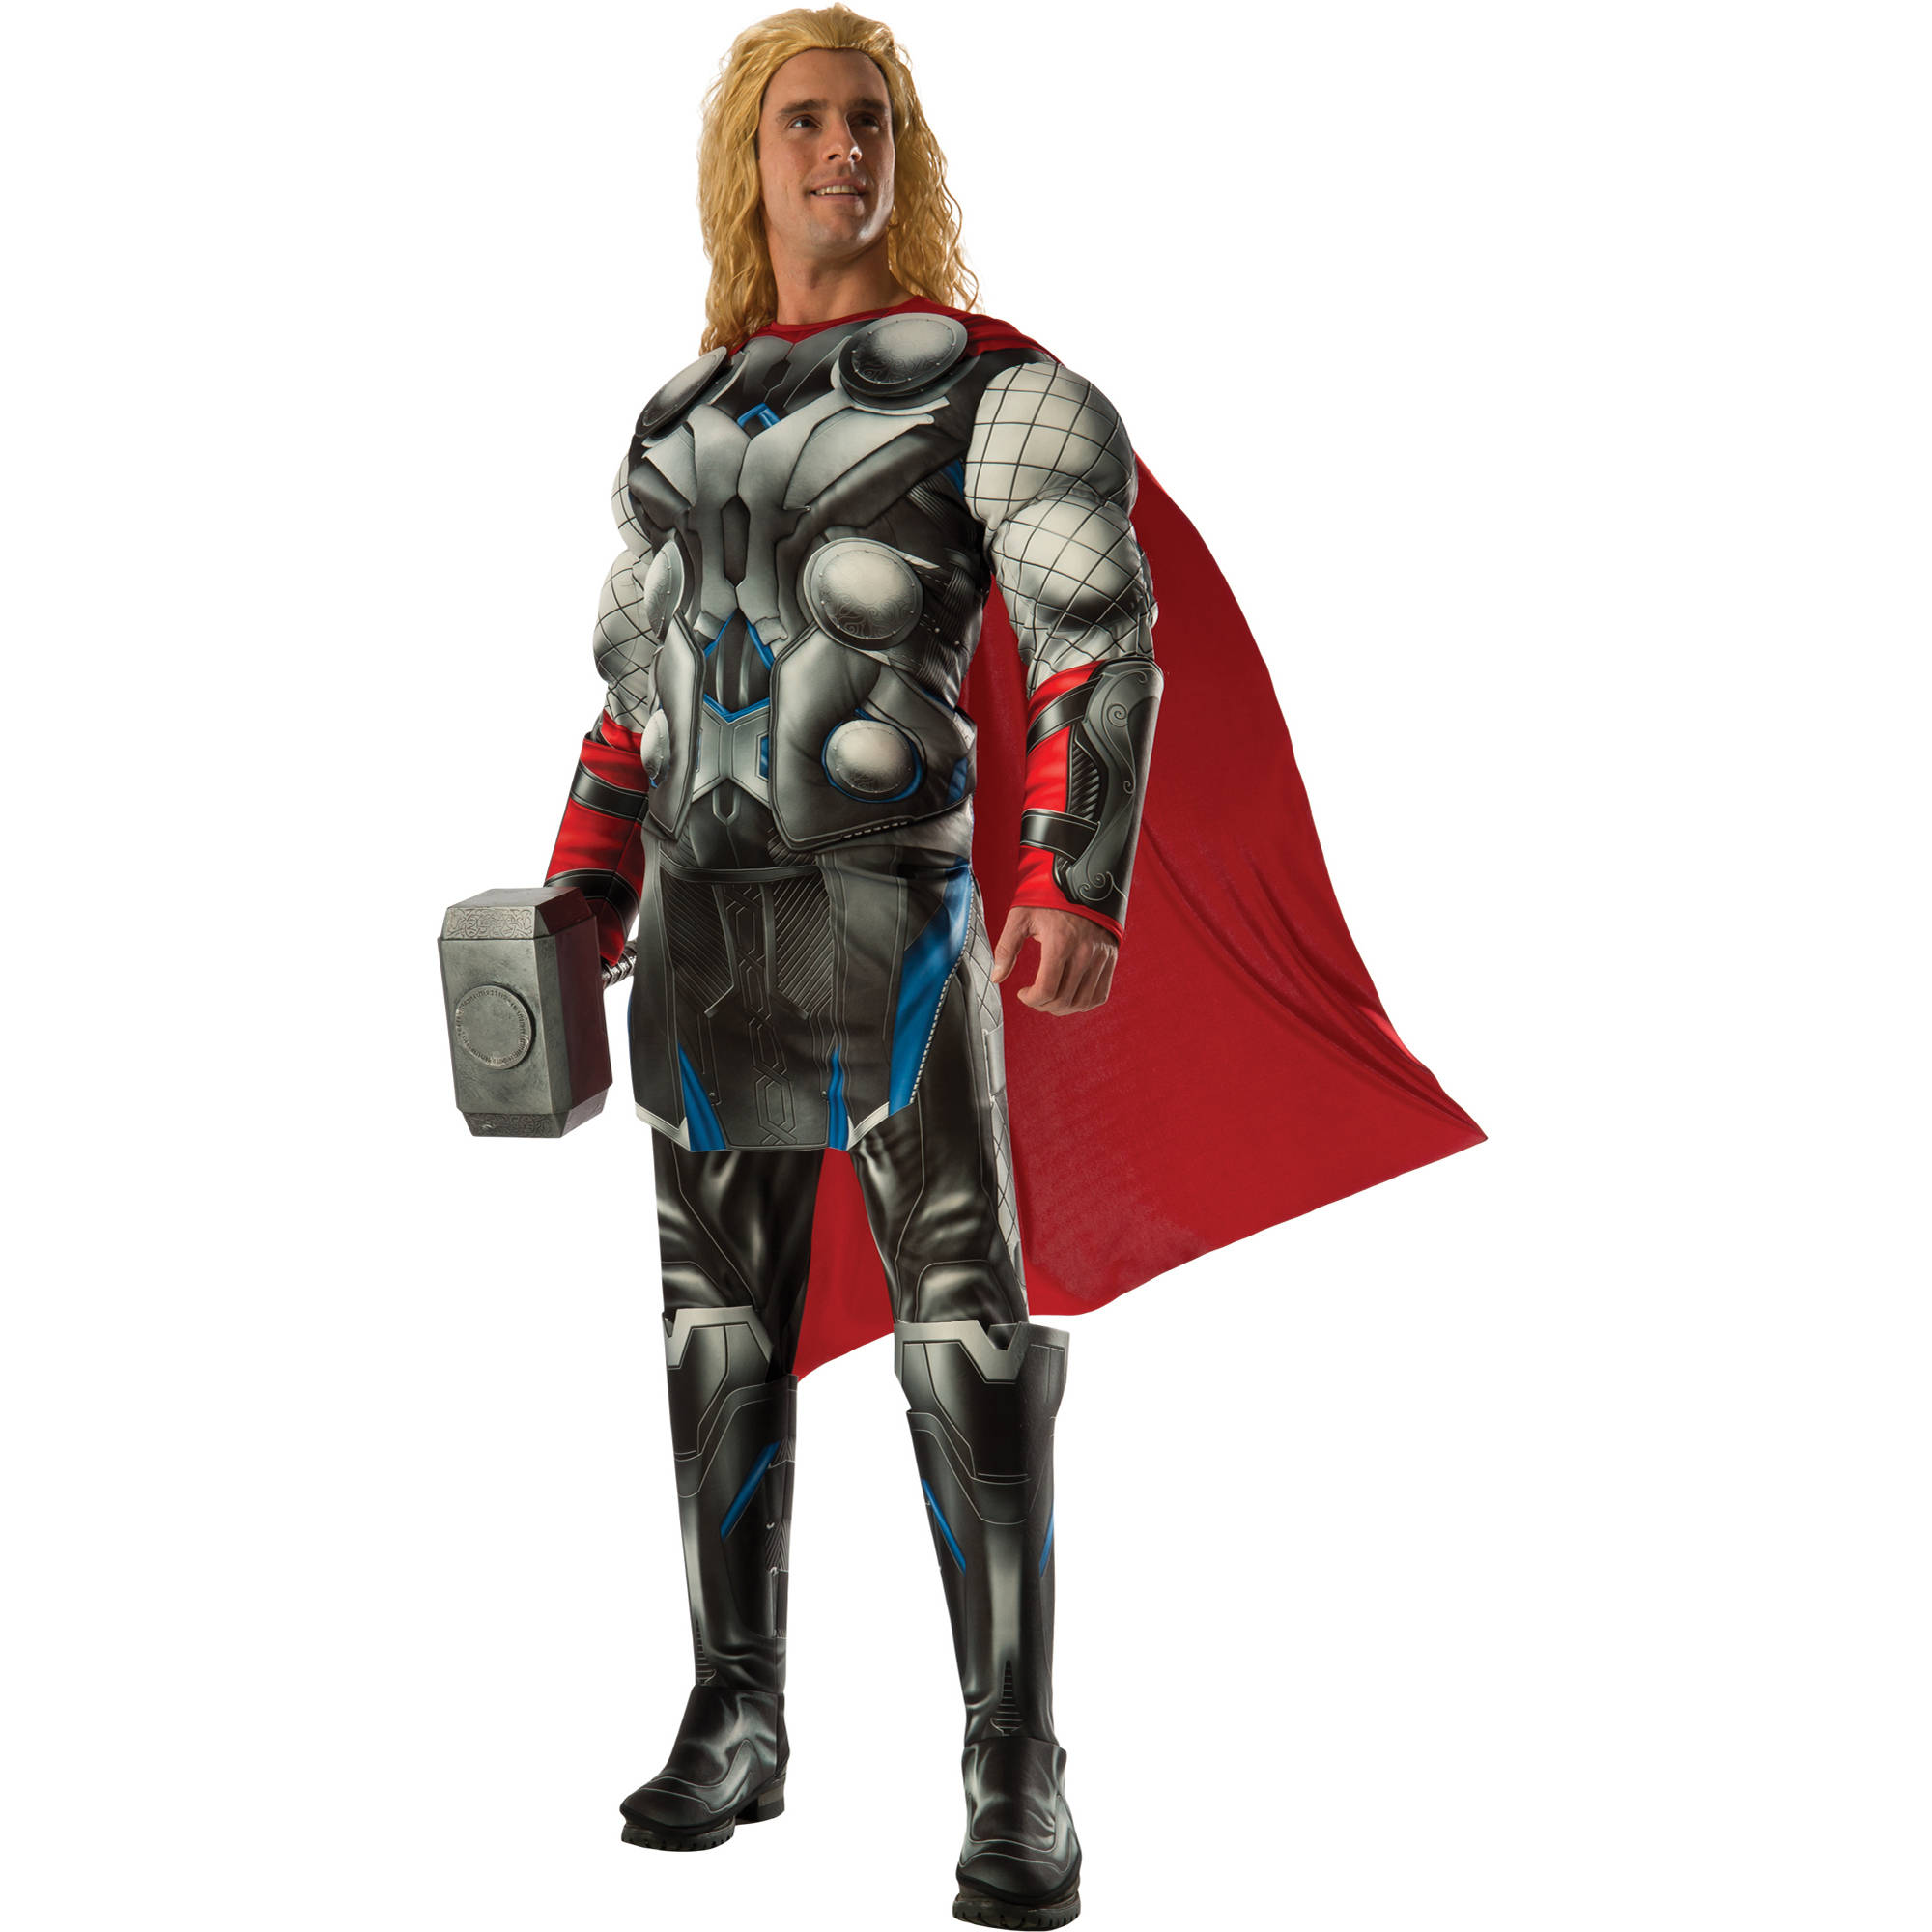 Thor Avengers Adult Halloween Costume